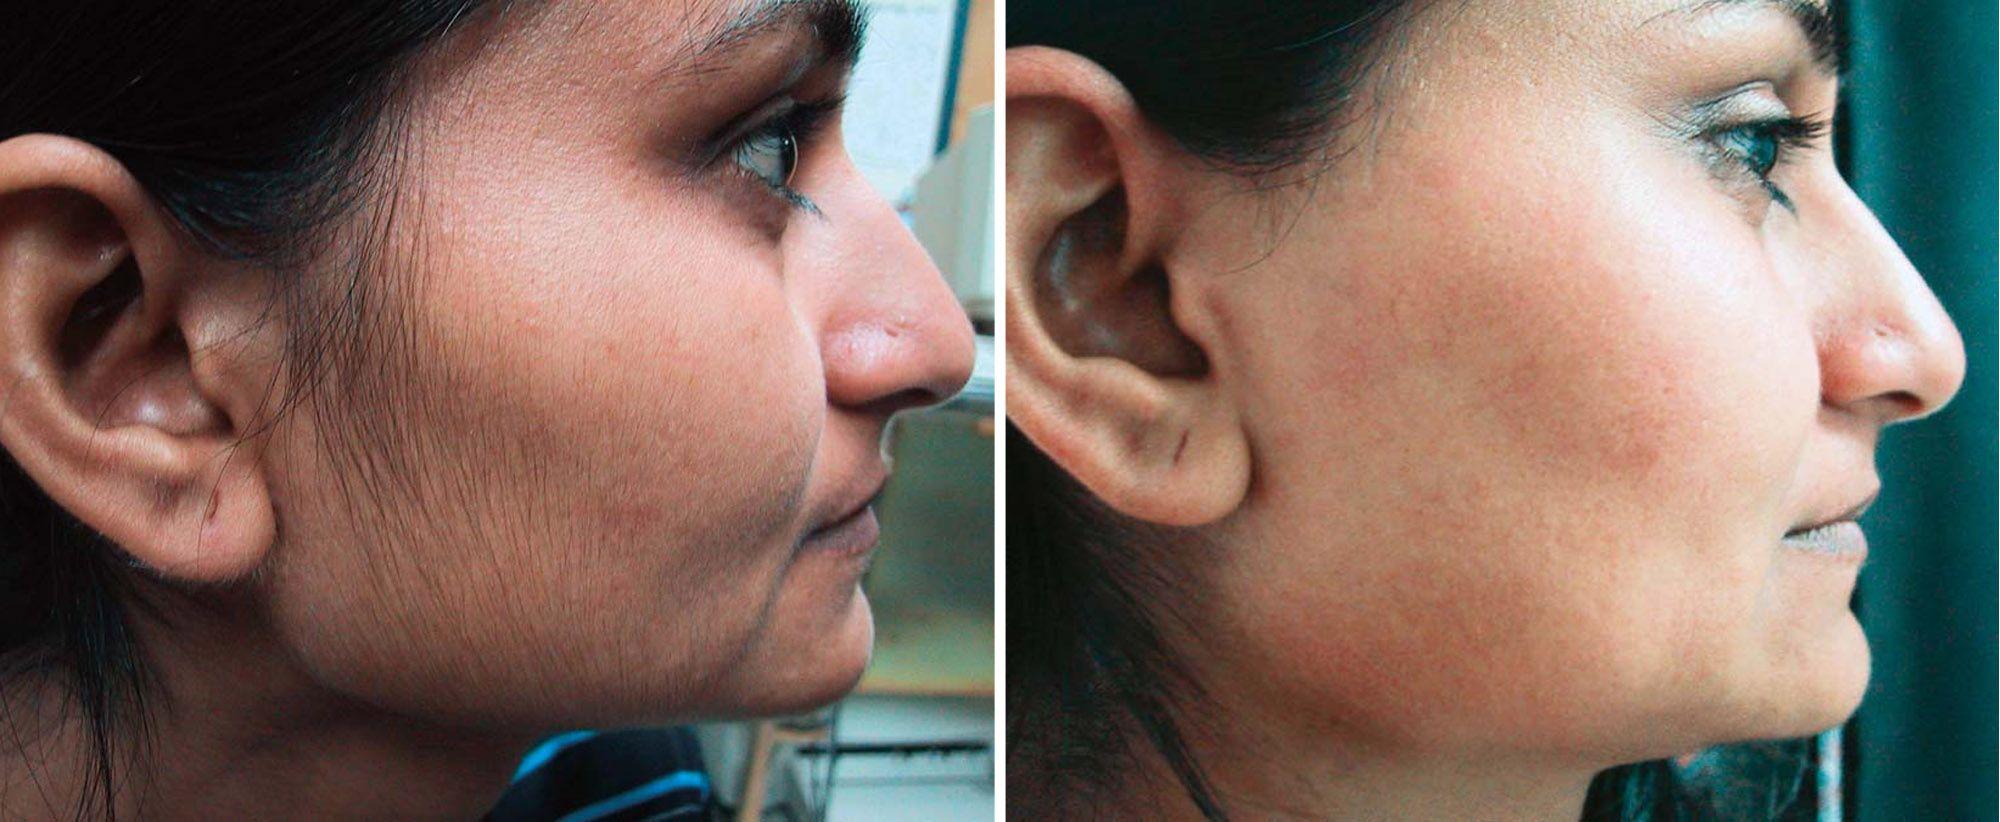 How To Get Rid Of Facial Hair Naturally Facial Hair And Remedies - Laser hair removal face